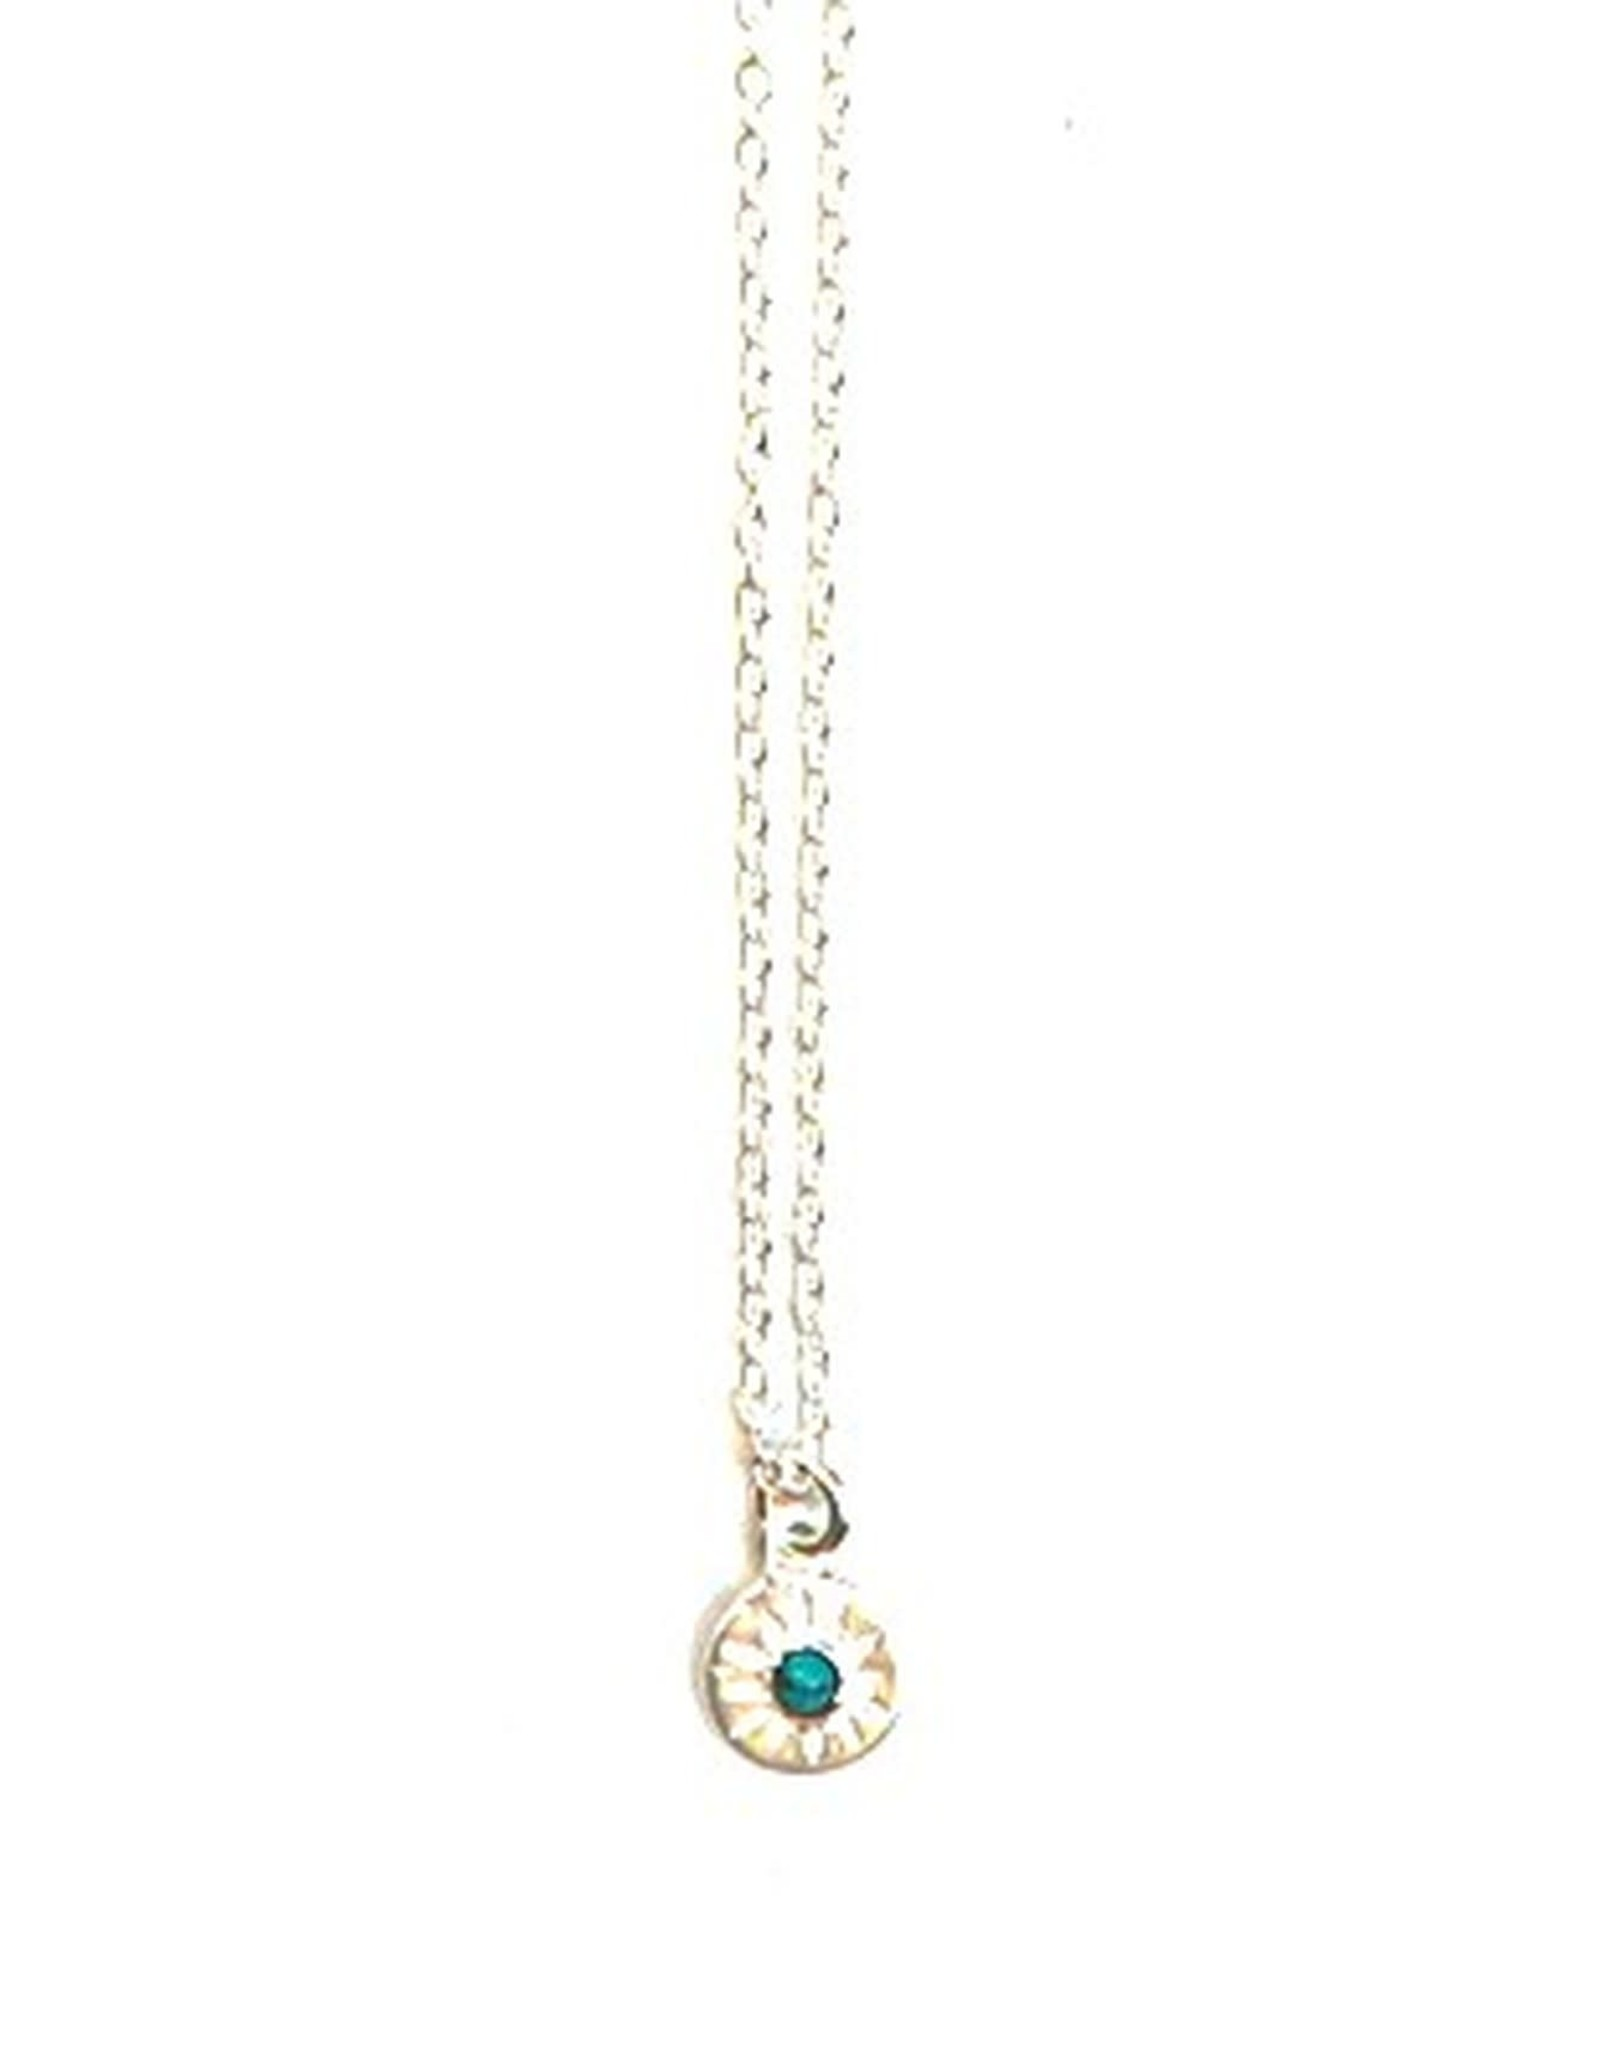 Starburst Sterling Silver Necklace